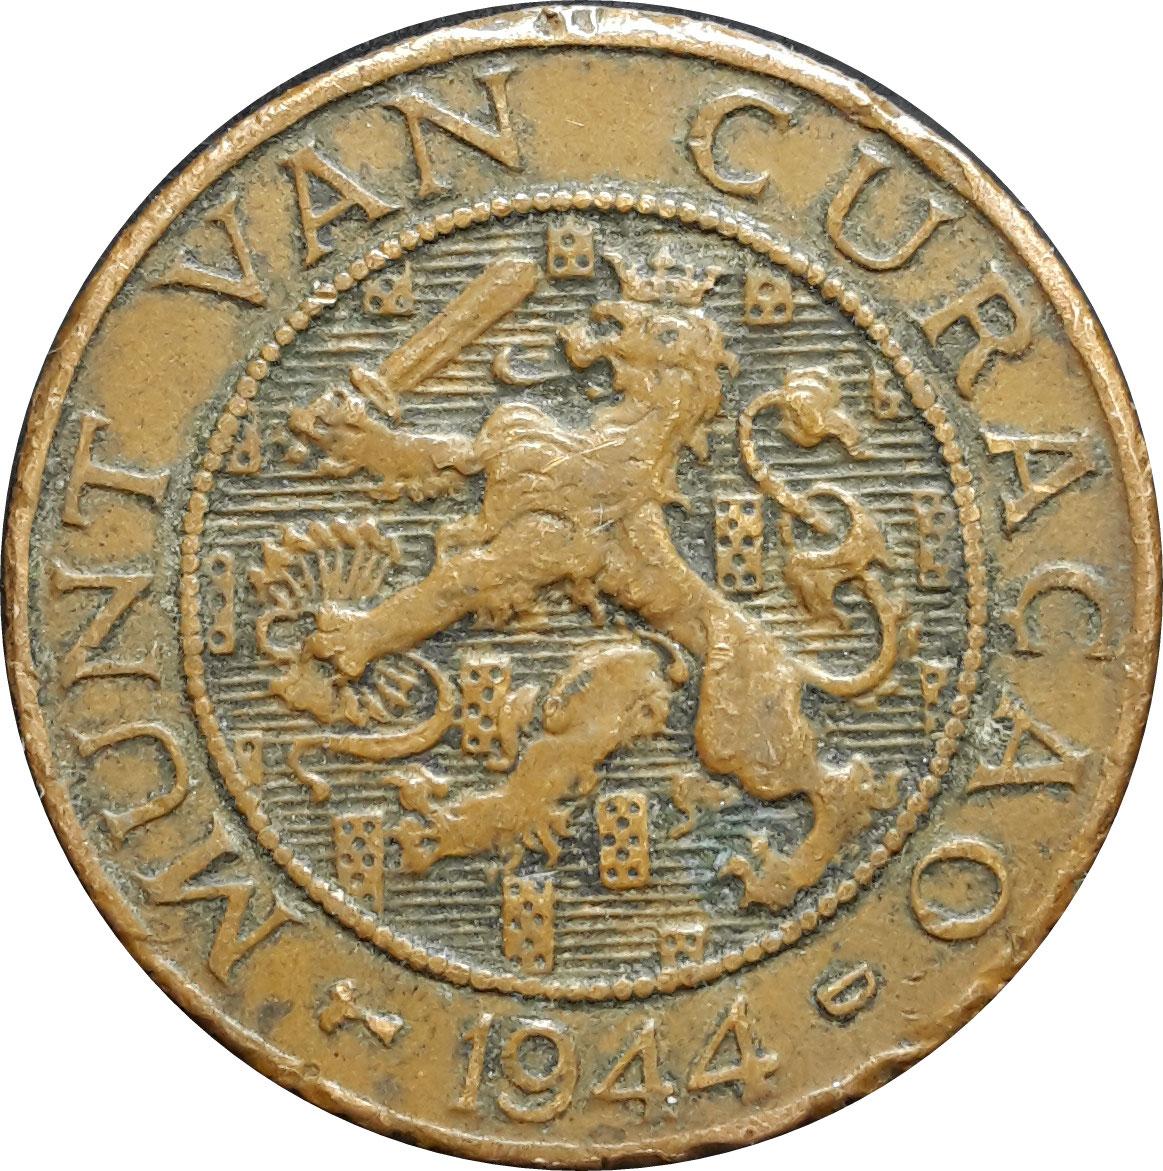 km235 Solomon Islands 10 Cents 2012 Oceania coin